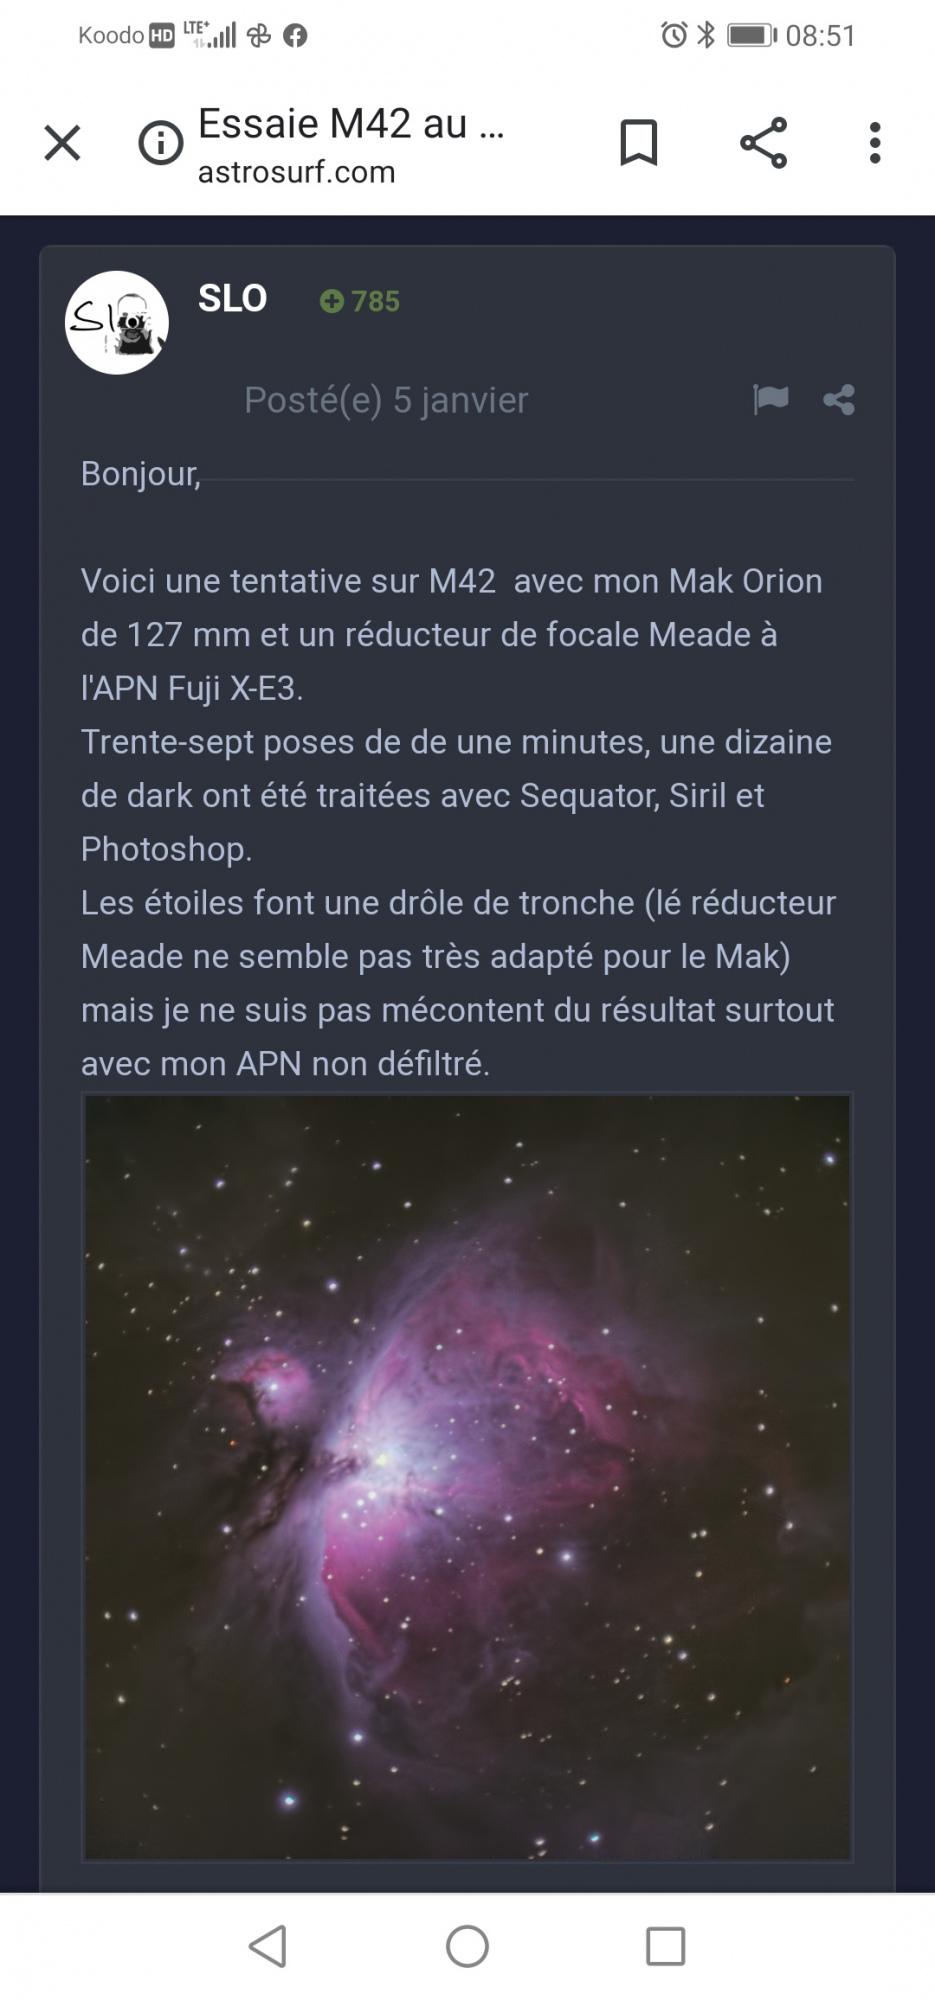 Screenshot_20200810_085109_com.android.chrome.thumb.jpg.8ed4f8dcd2cdef31a04d03bcbb6c31b2.jpg